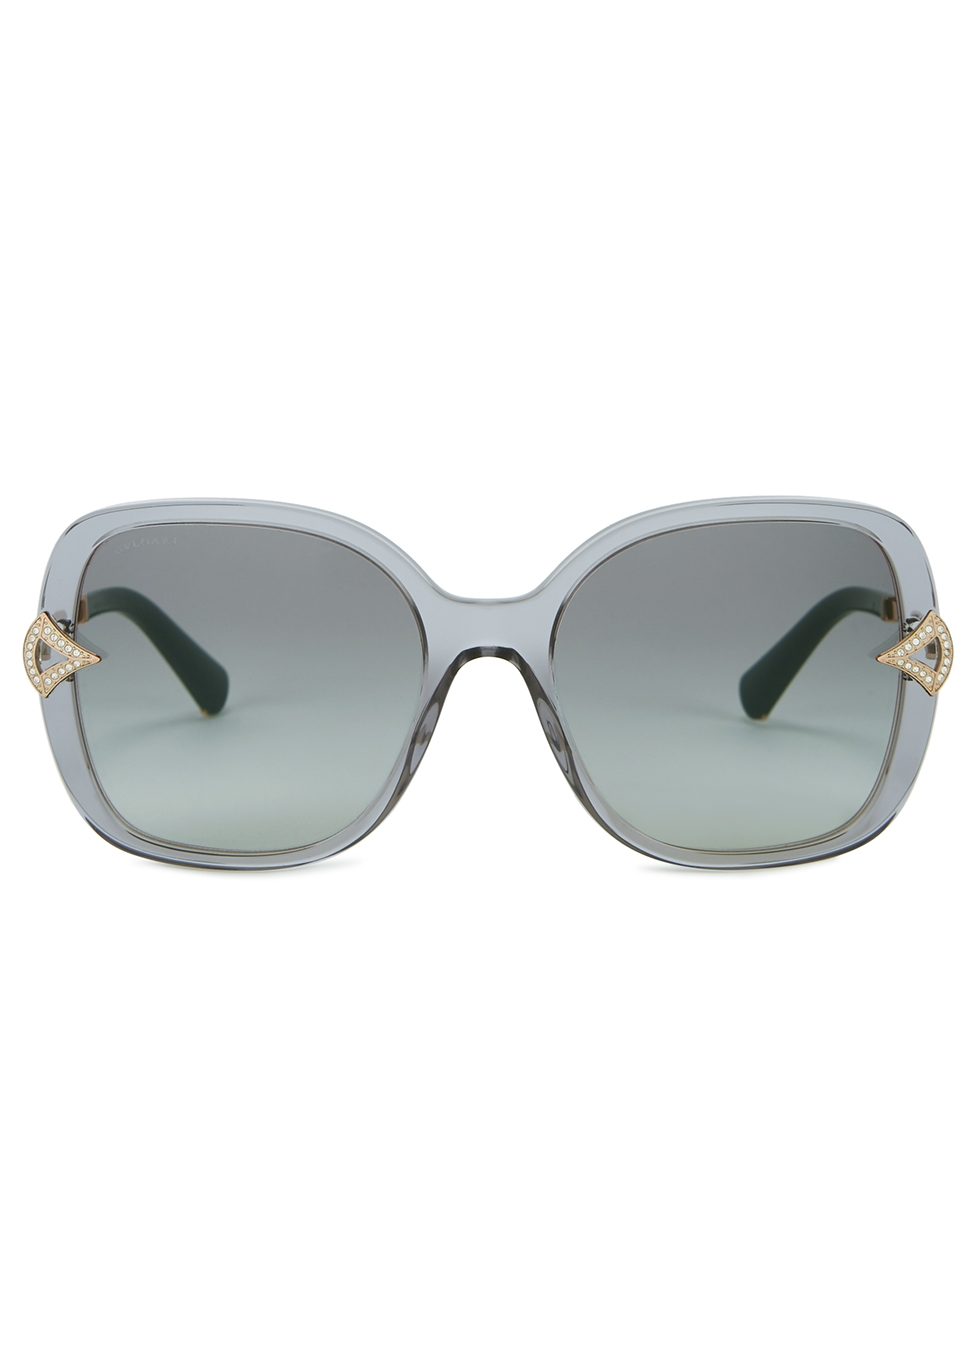 Transparent grey oversized sunglasses - BVLGARI